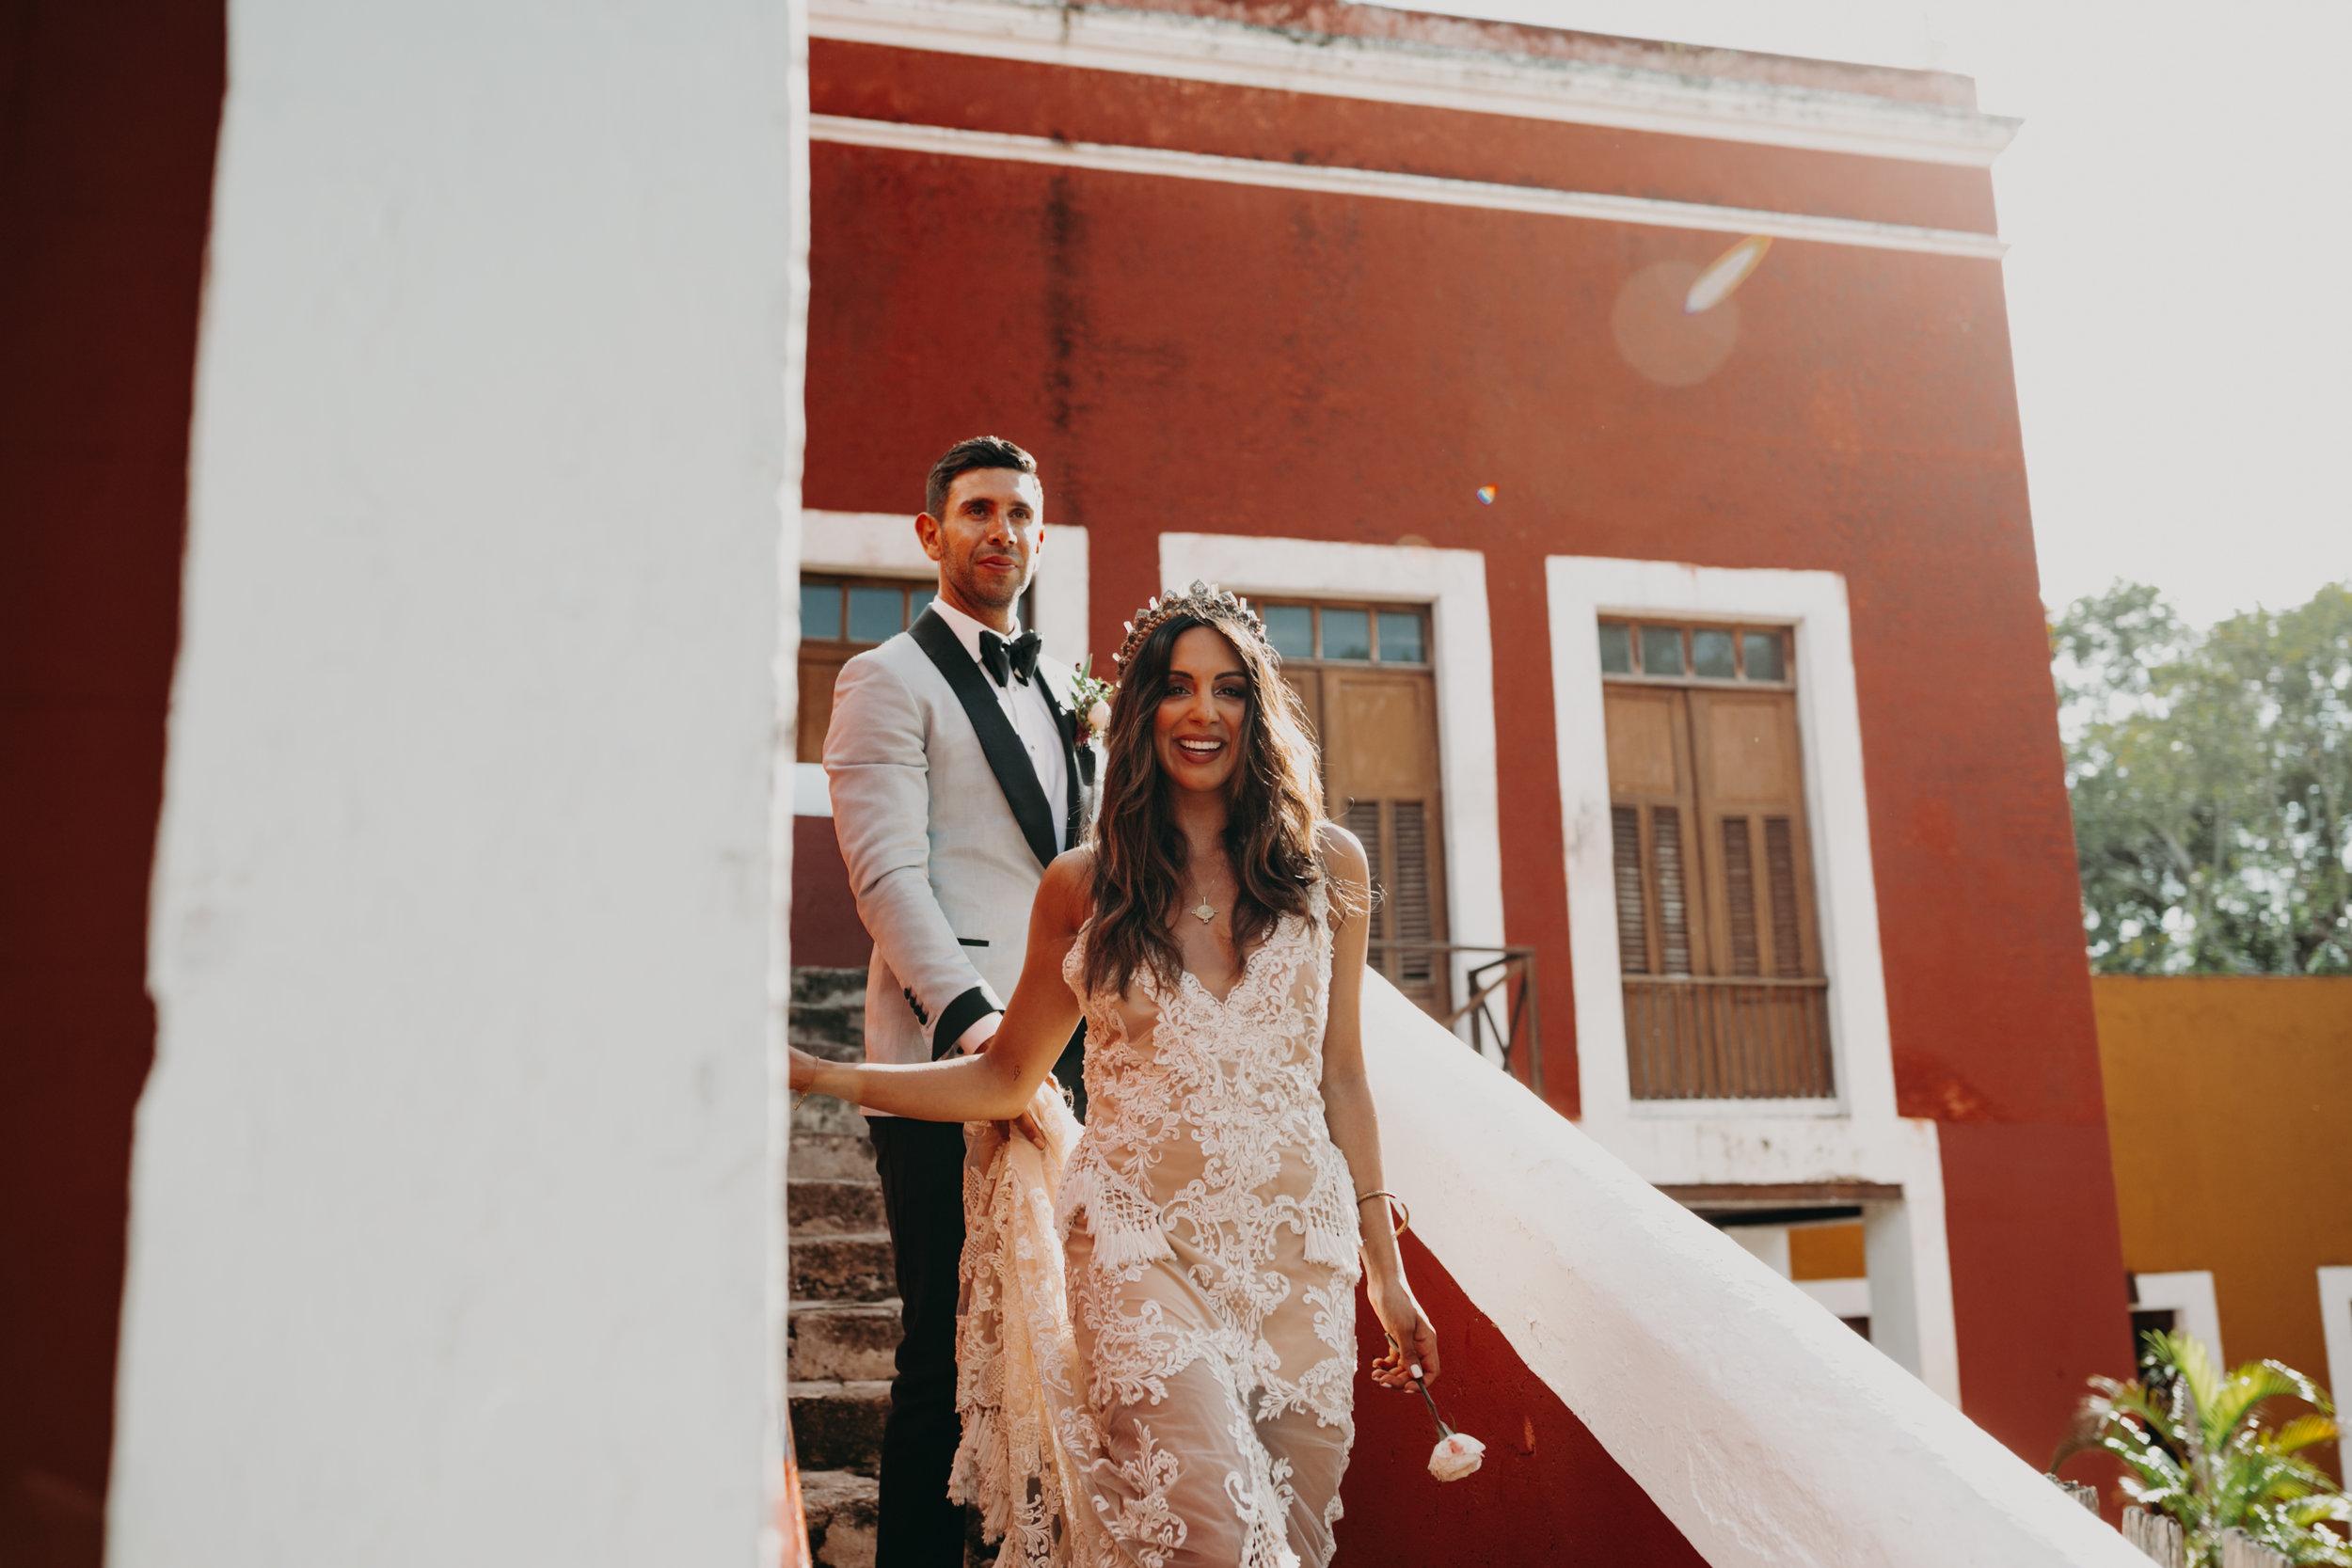 Hacienda Temozon Yucatan Mexico Wedding | Ida & Peter Emily Magers Photography-659.jpg